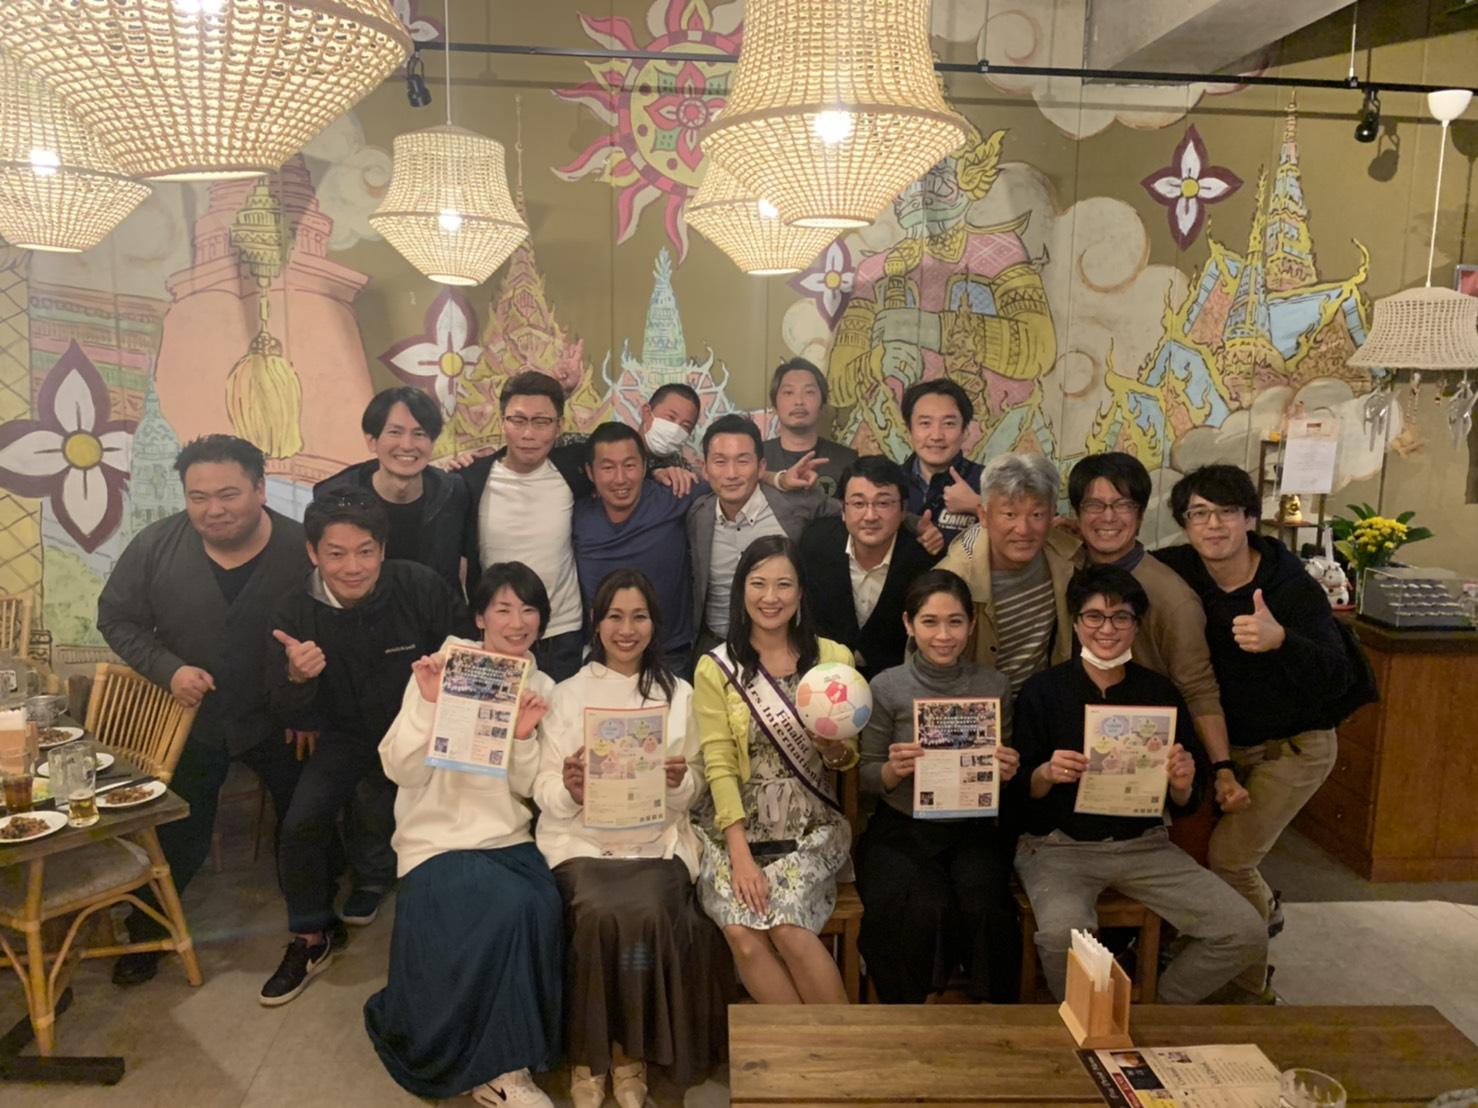 NPOボールひとつが繋ぐ縁7 タイ王国 バンコク bannmahamek LIVE支援(2021年4月17日)